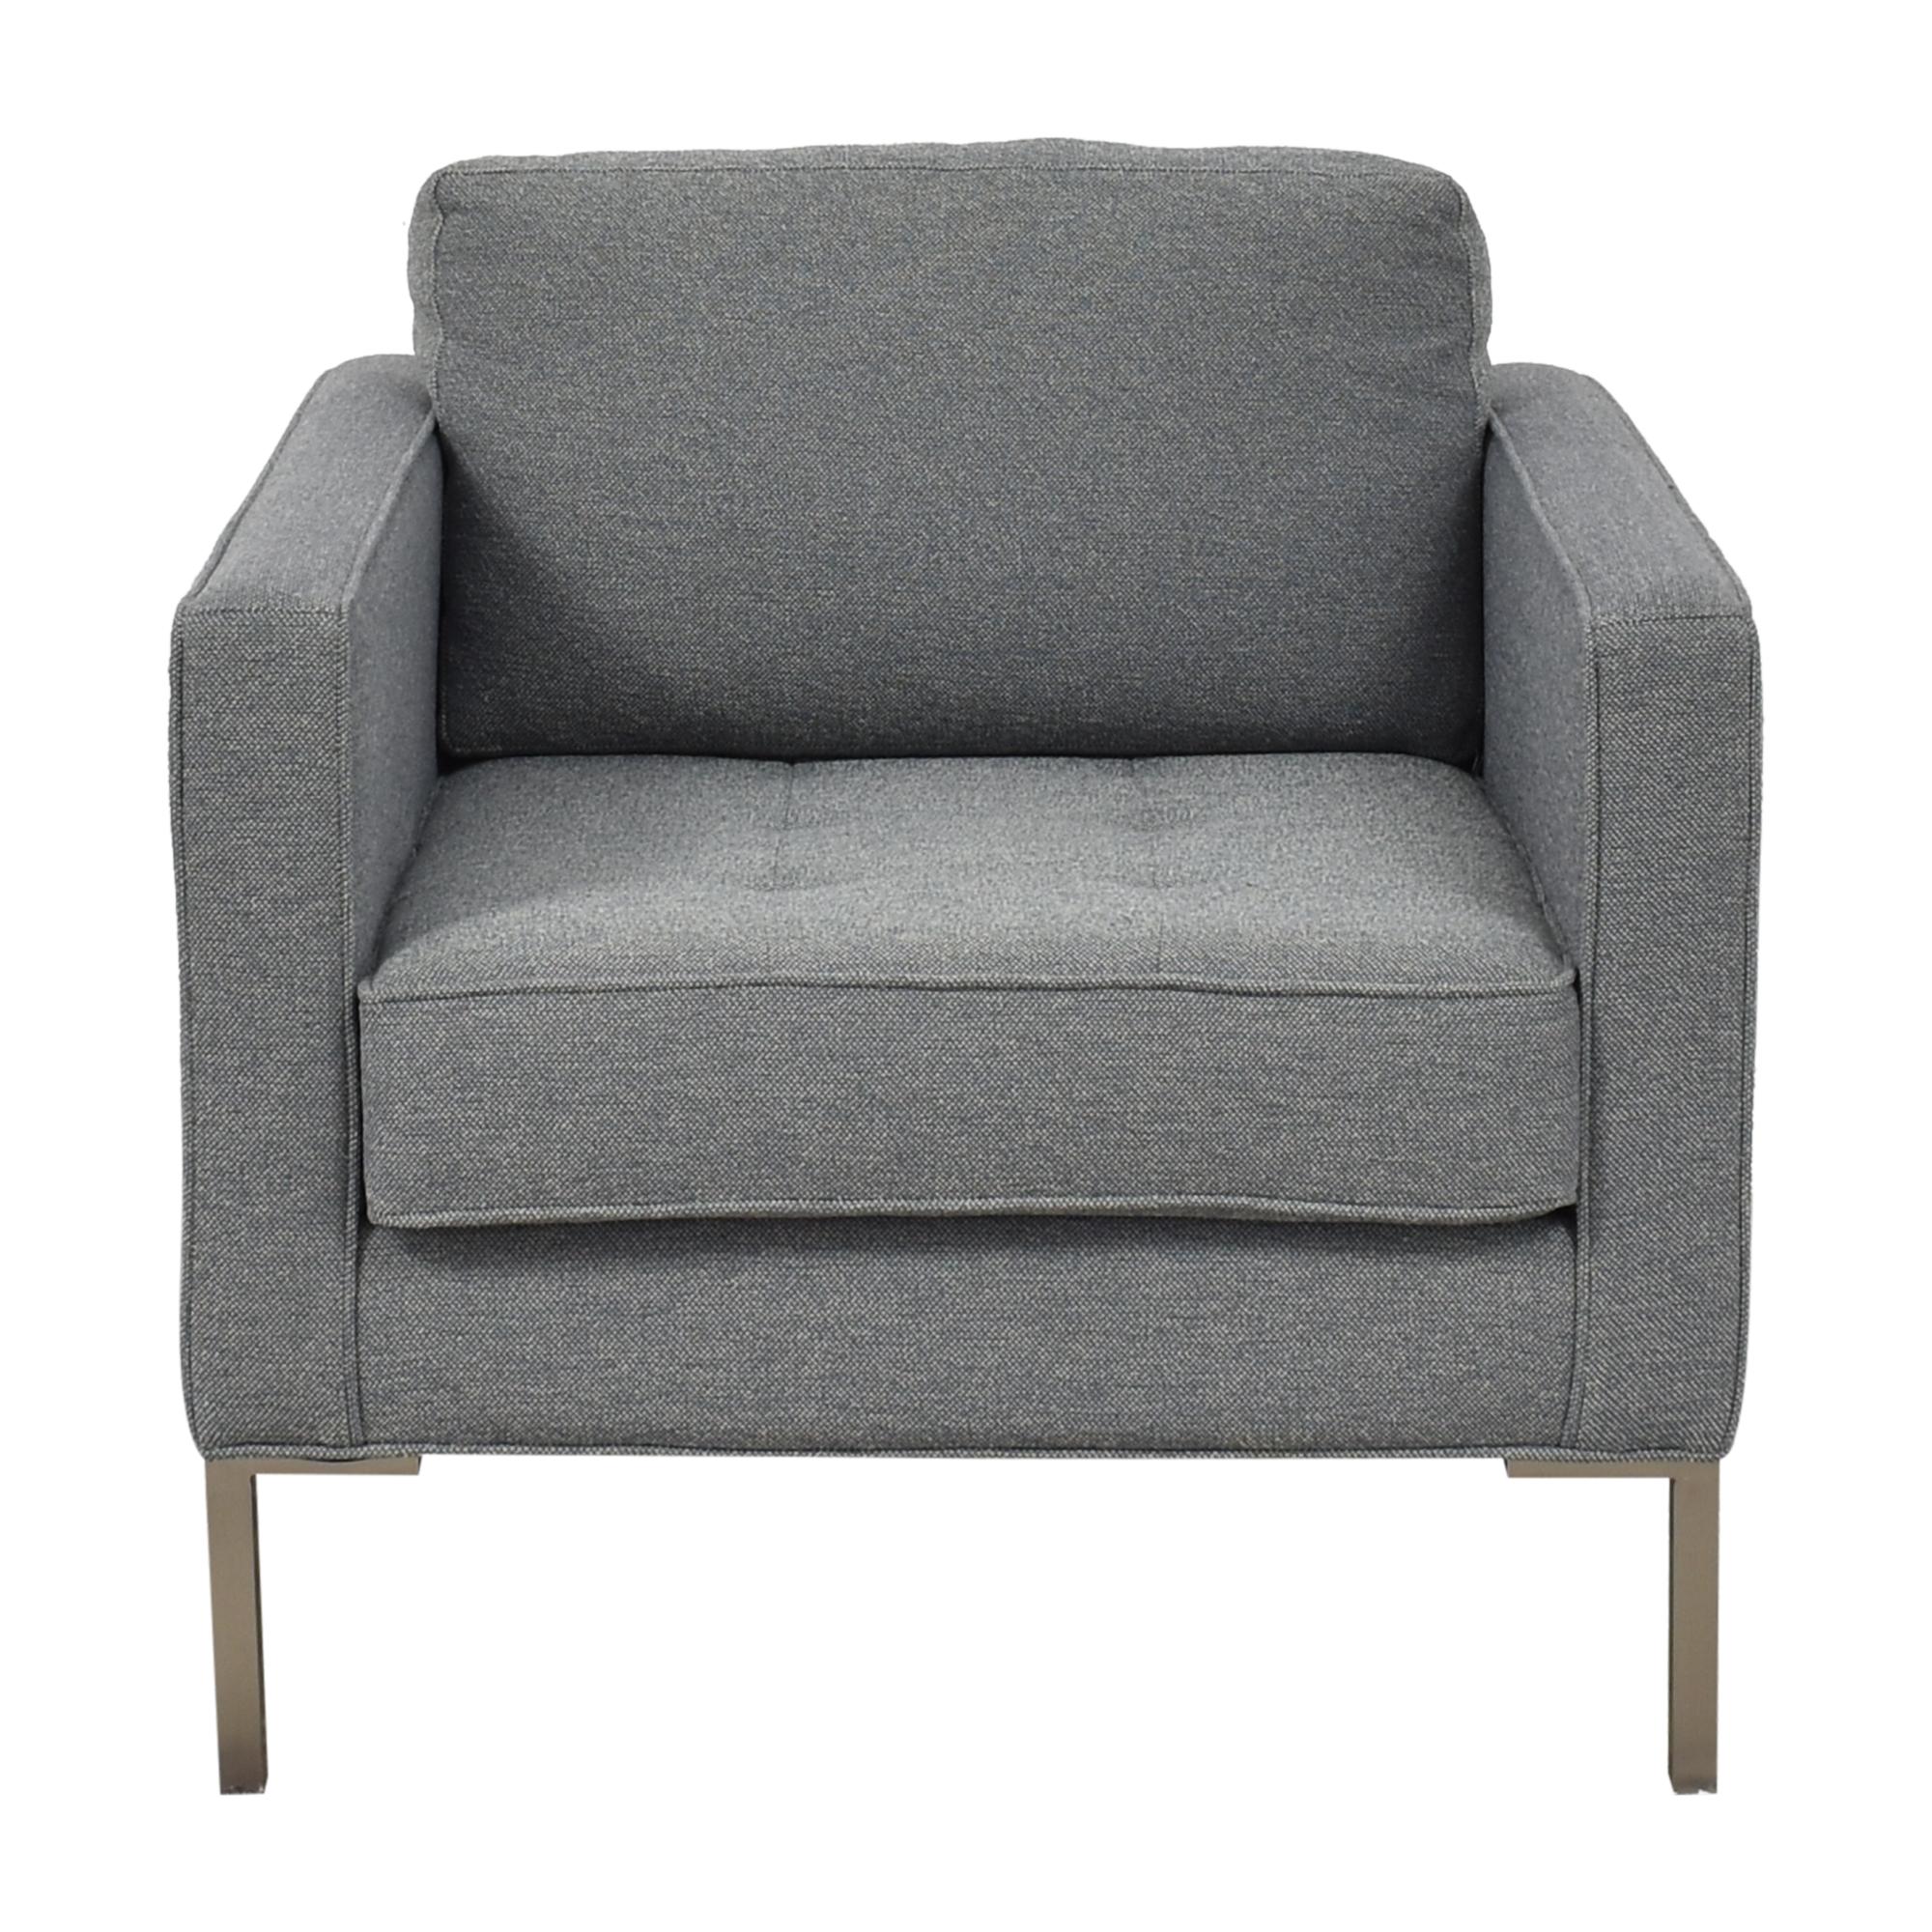 Blu Dot Blu Dot Paramount Lounge Chair Chairs